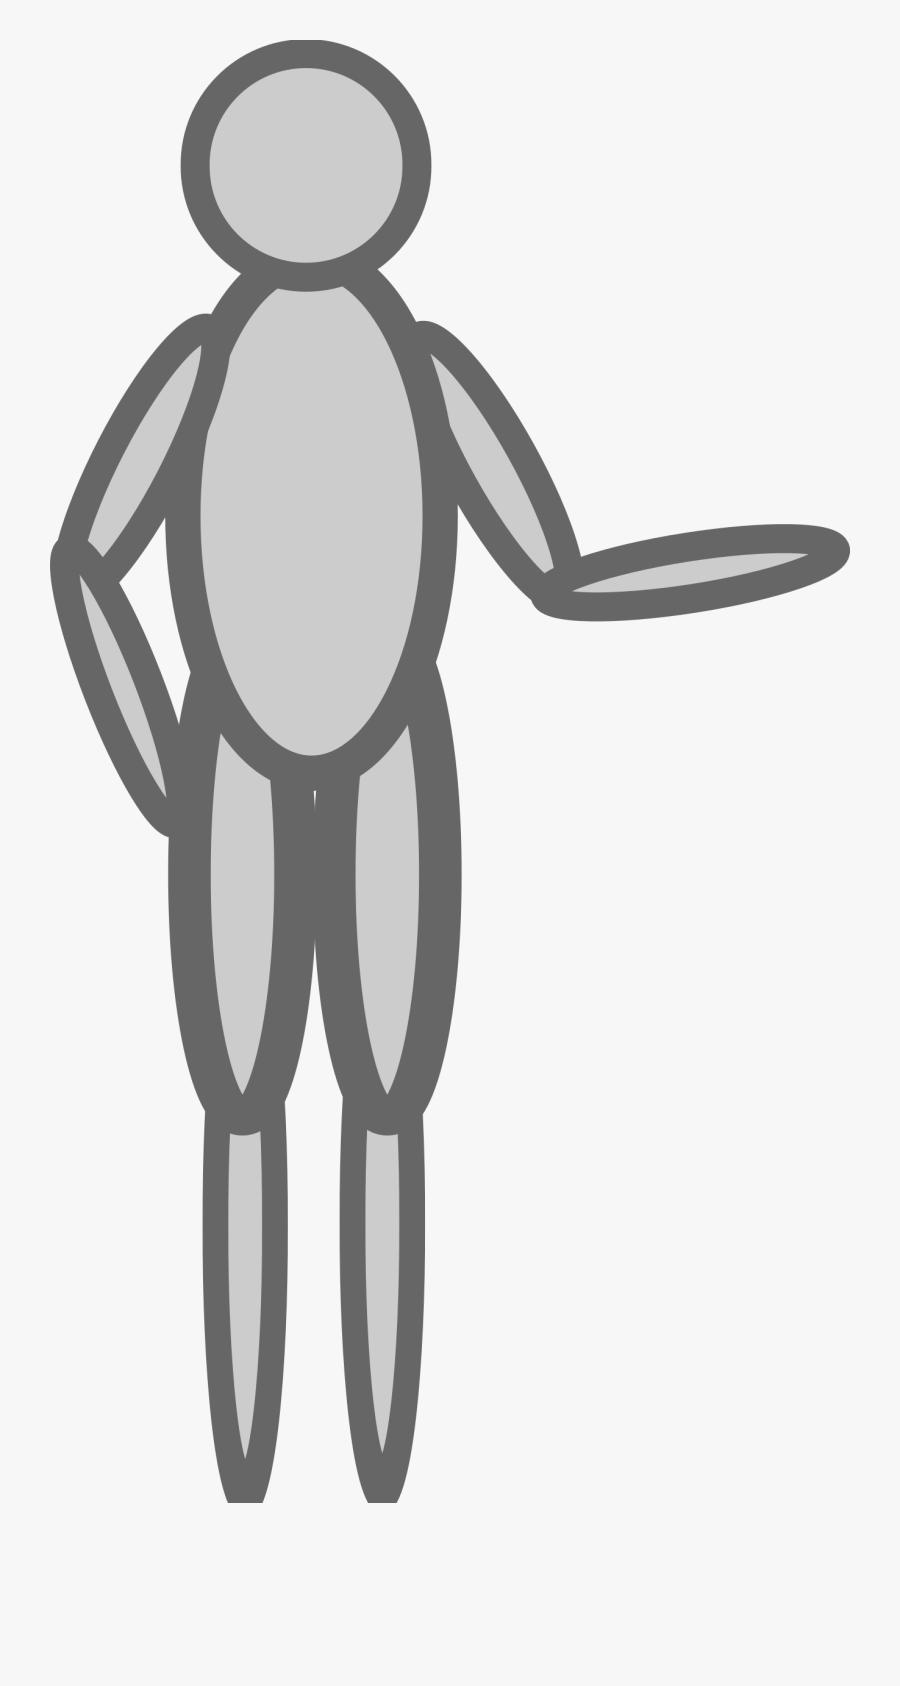 Transparent People Talking Png - Clip Art Person, Transparent Clipart